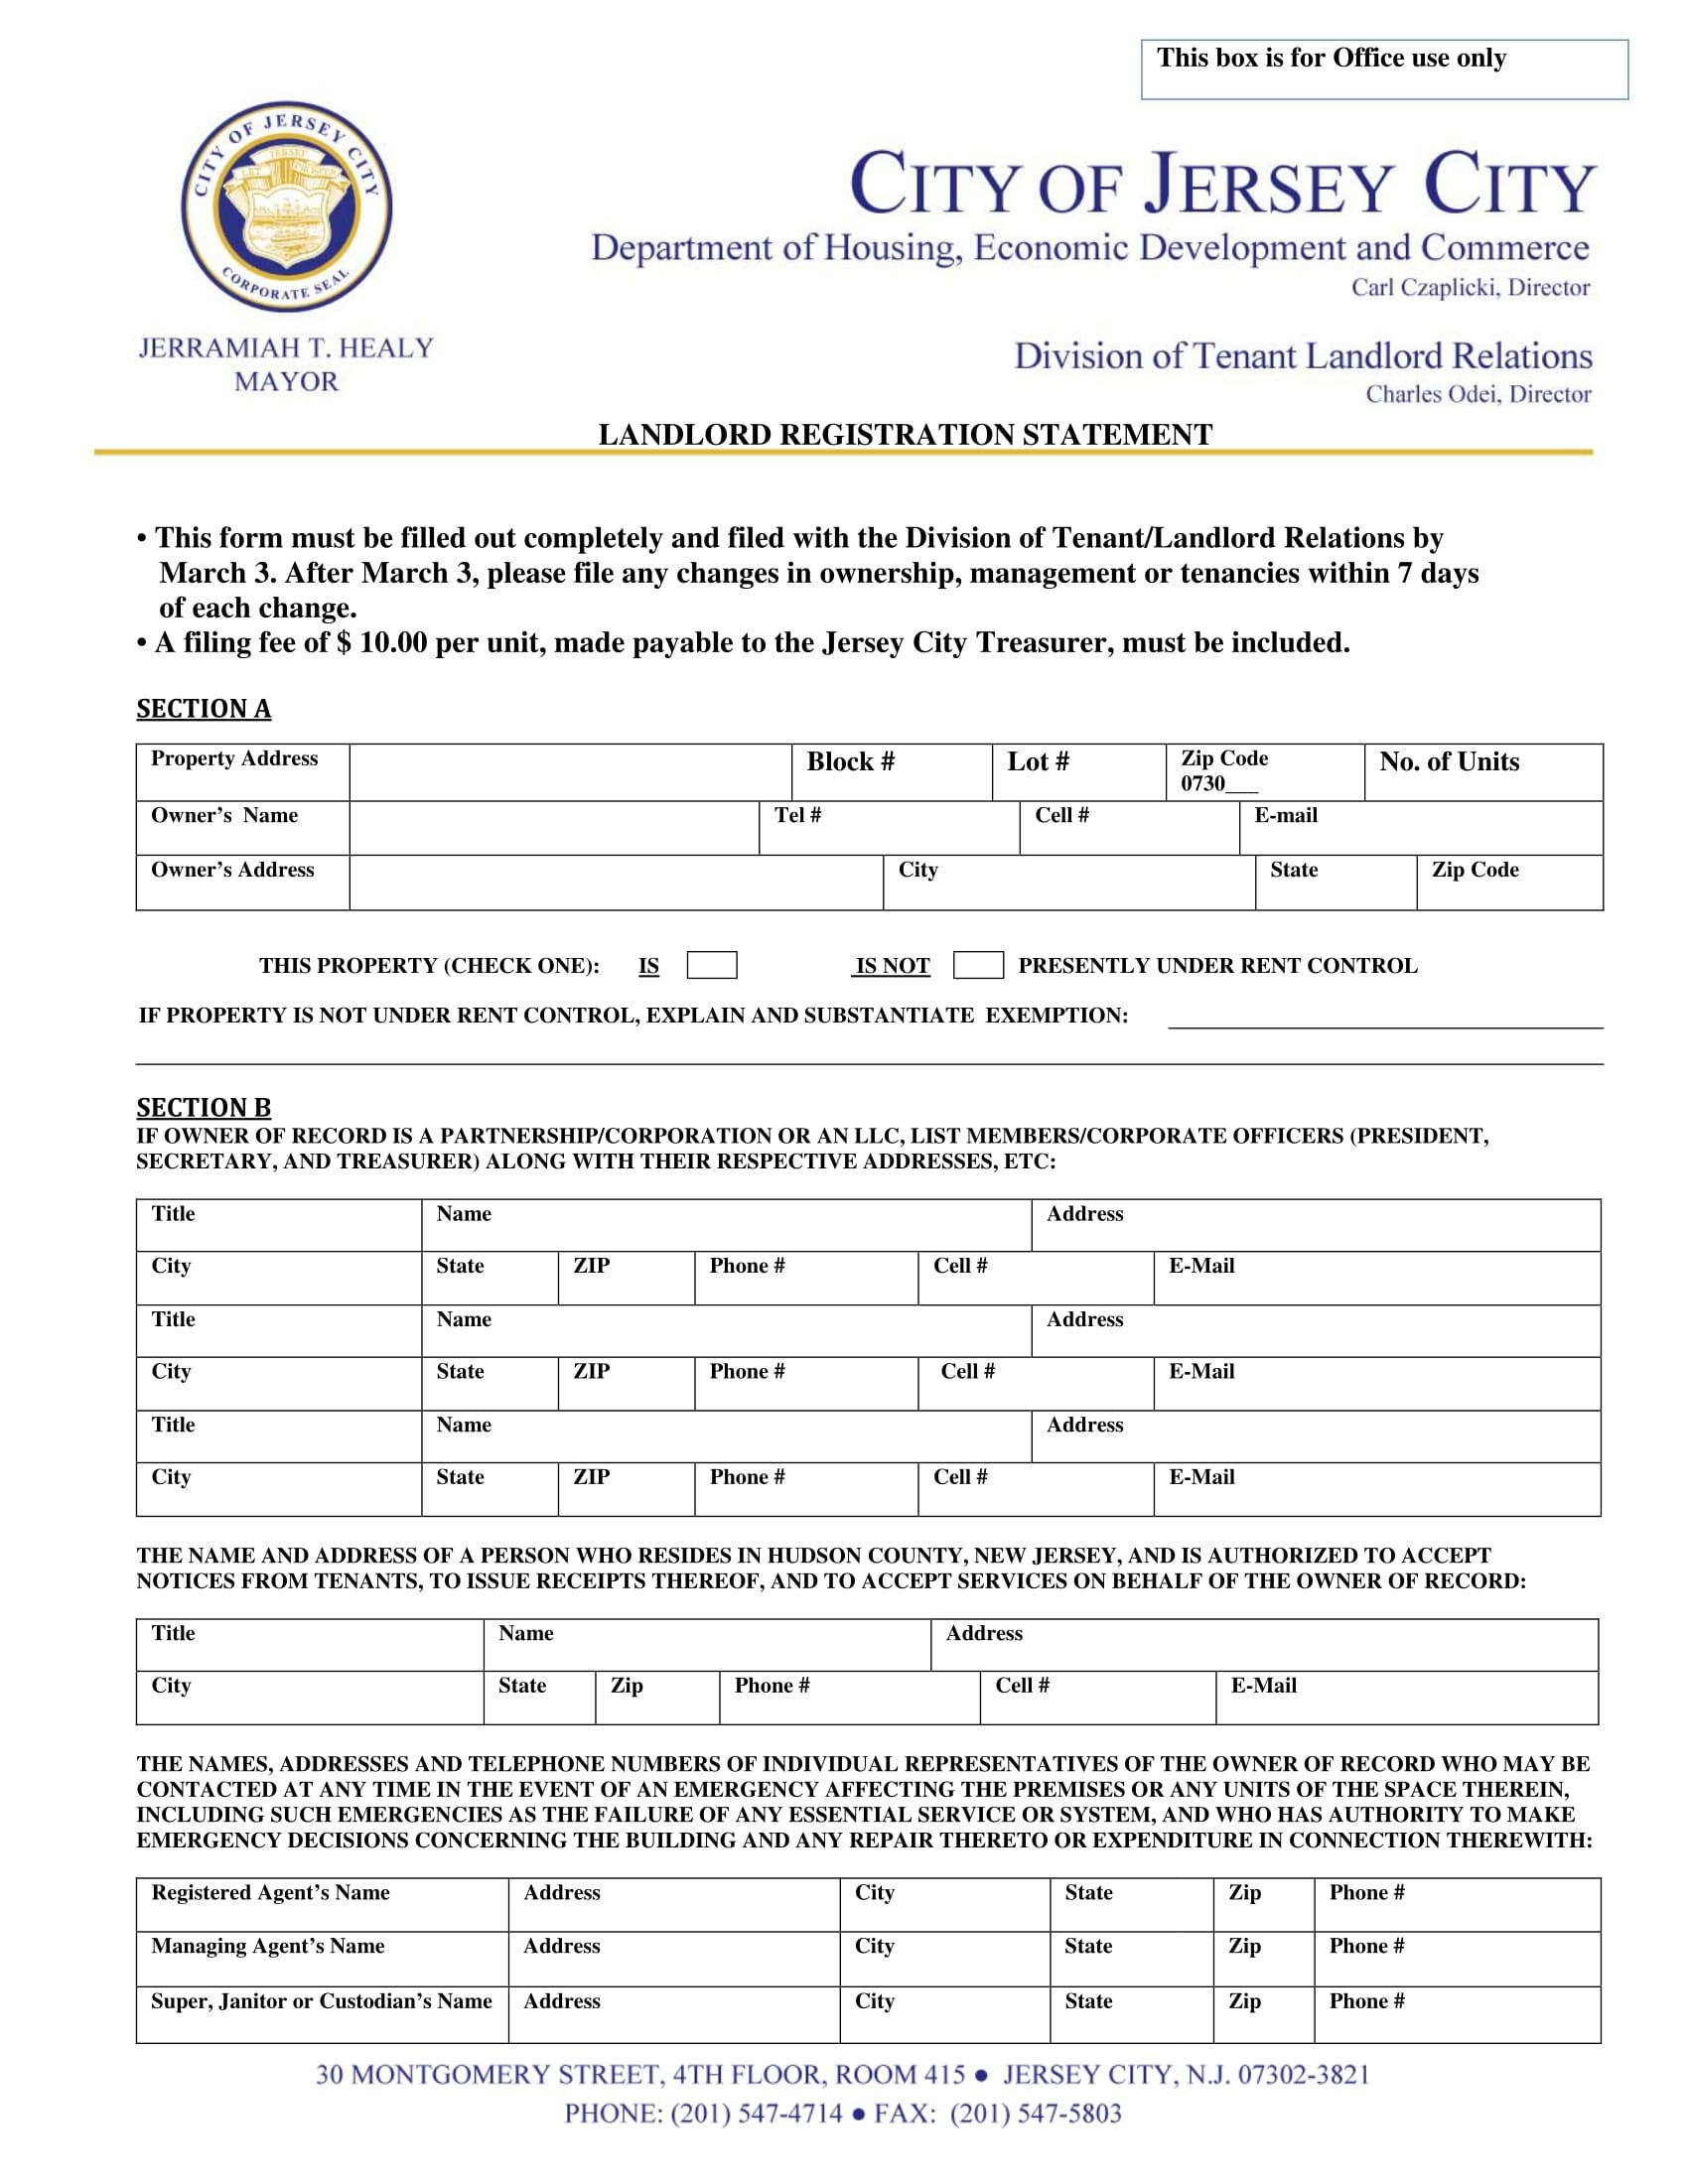 landlord city registration statement form 1